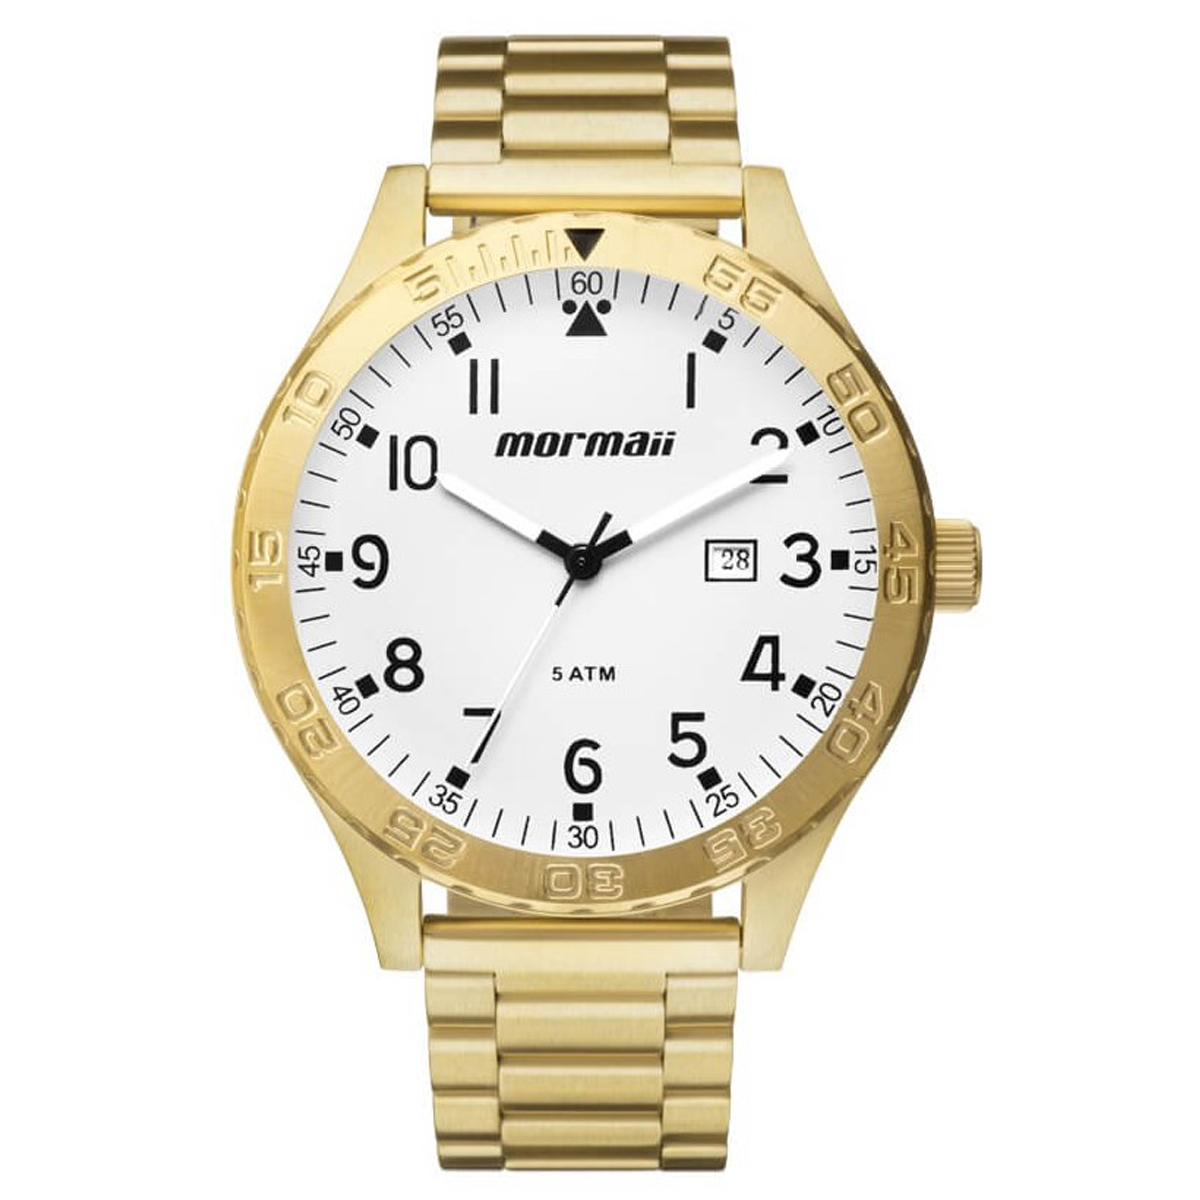 8e4988c26efc2 Relógio Mormaii Loyal 2.0 Golden Bianco ref MO2115AN 4C